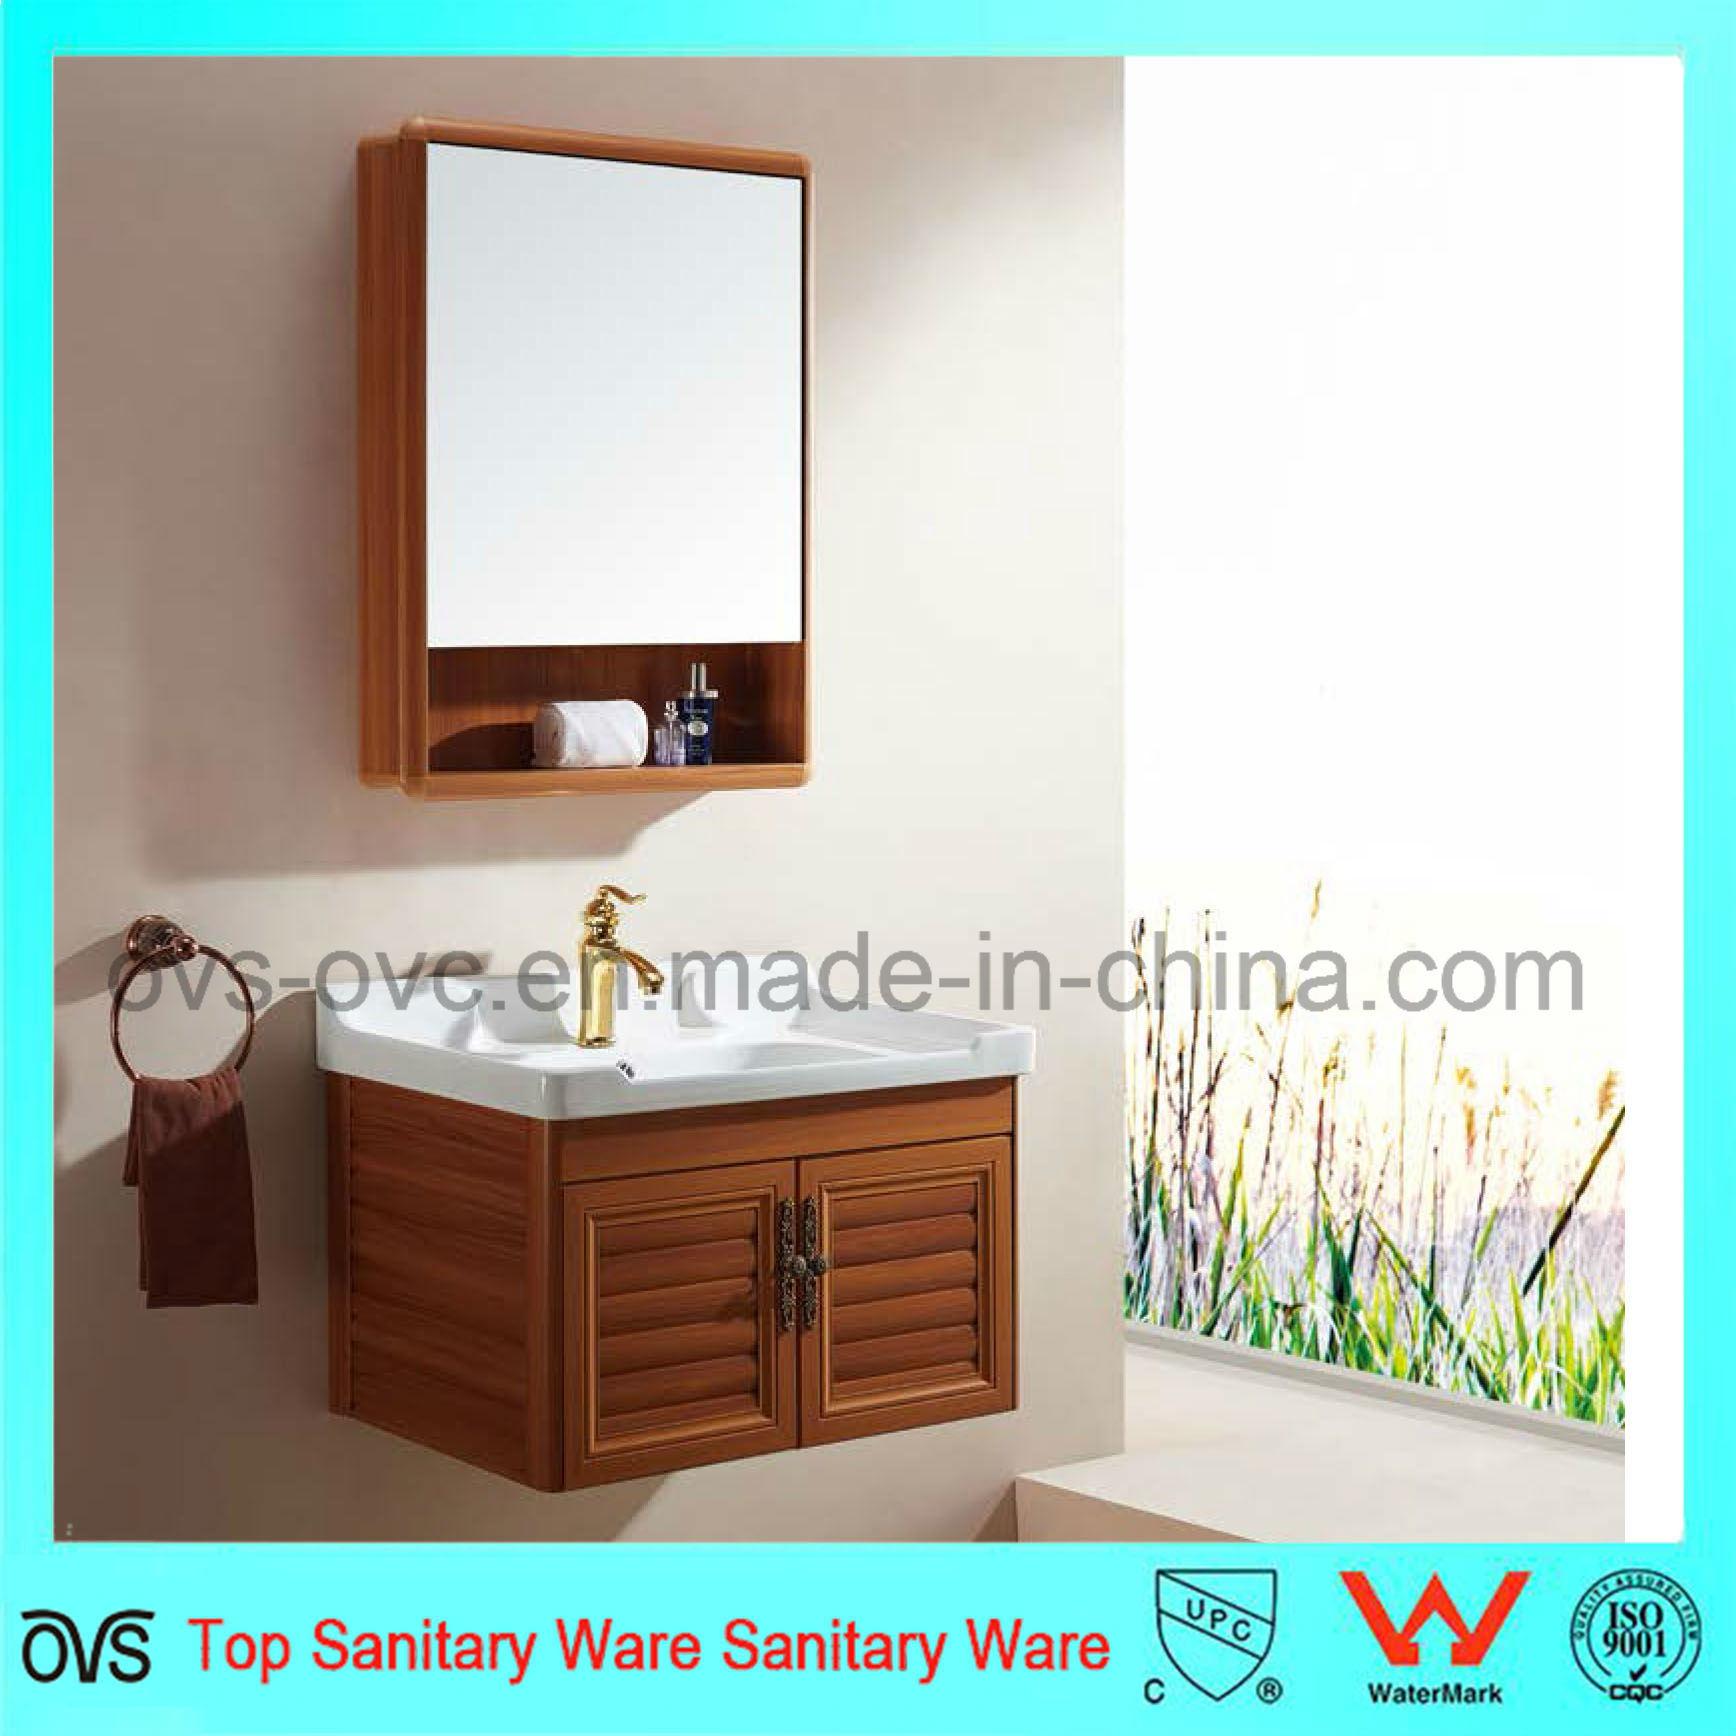 Bathroom Mirrors.China 27 55 Fancy Bathroom Mirrors Vanity Cabinets With Basin